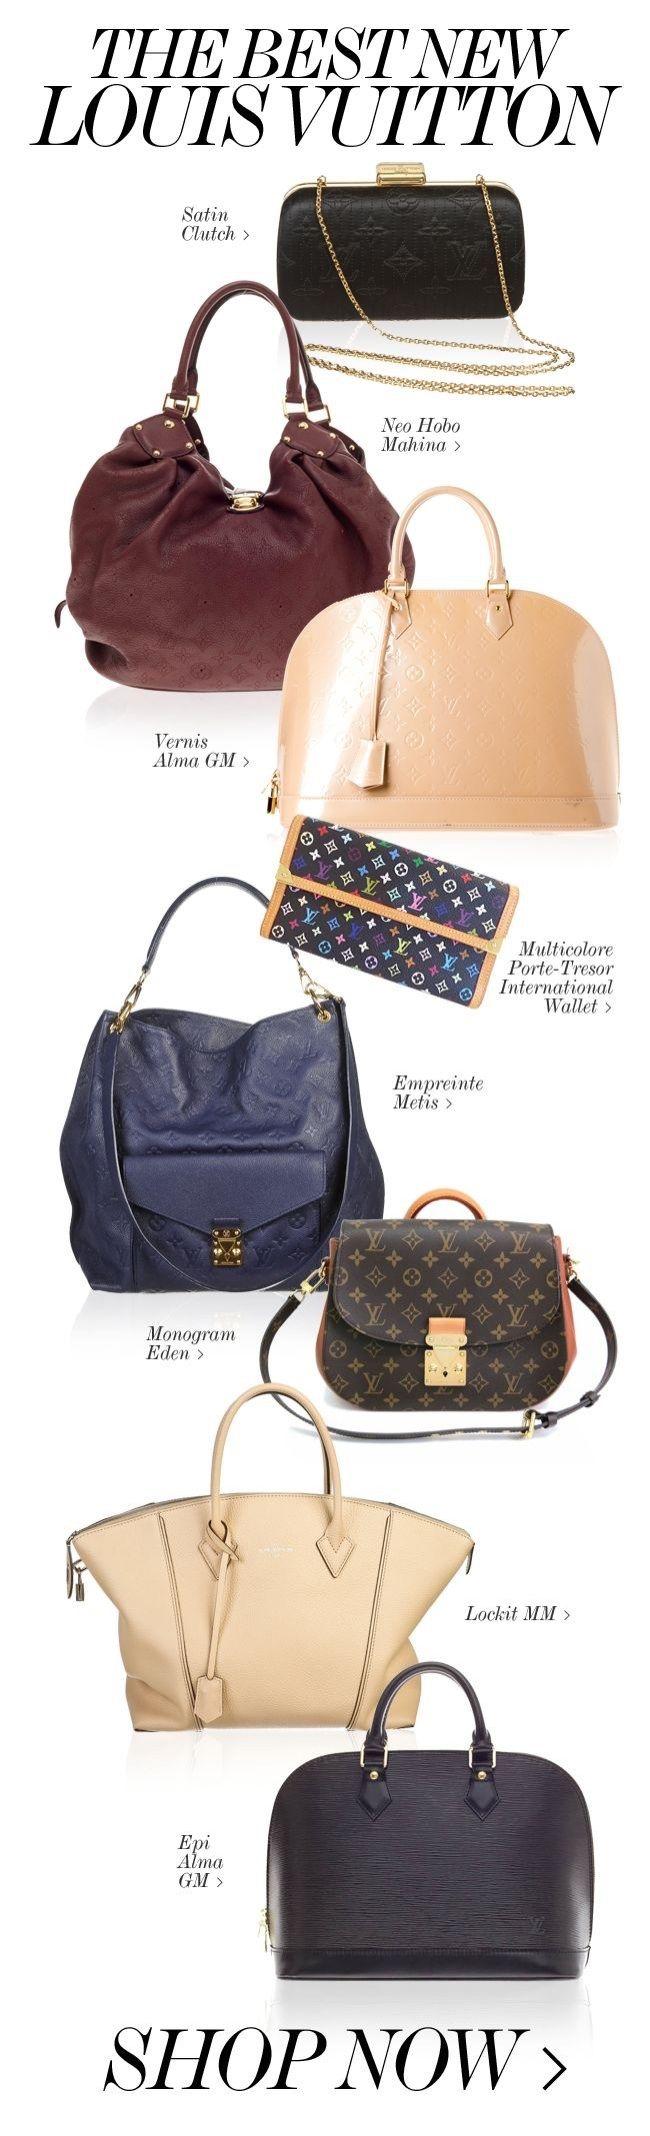 Lv сумки модные брендовые, http://bags-lovers.livejournal